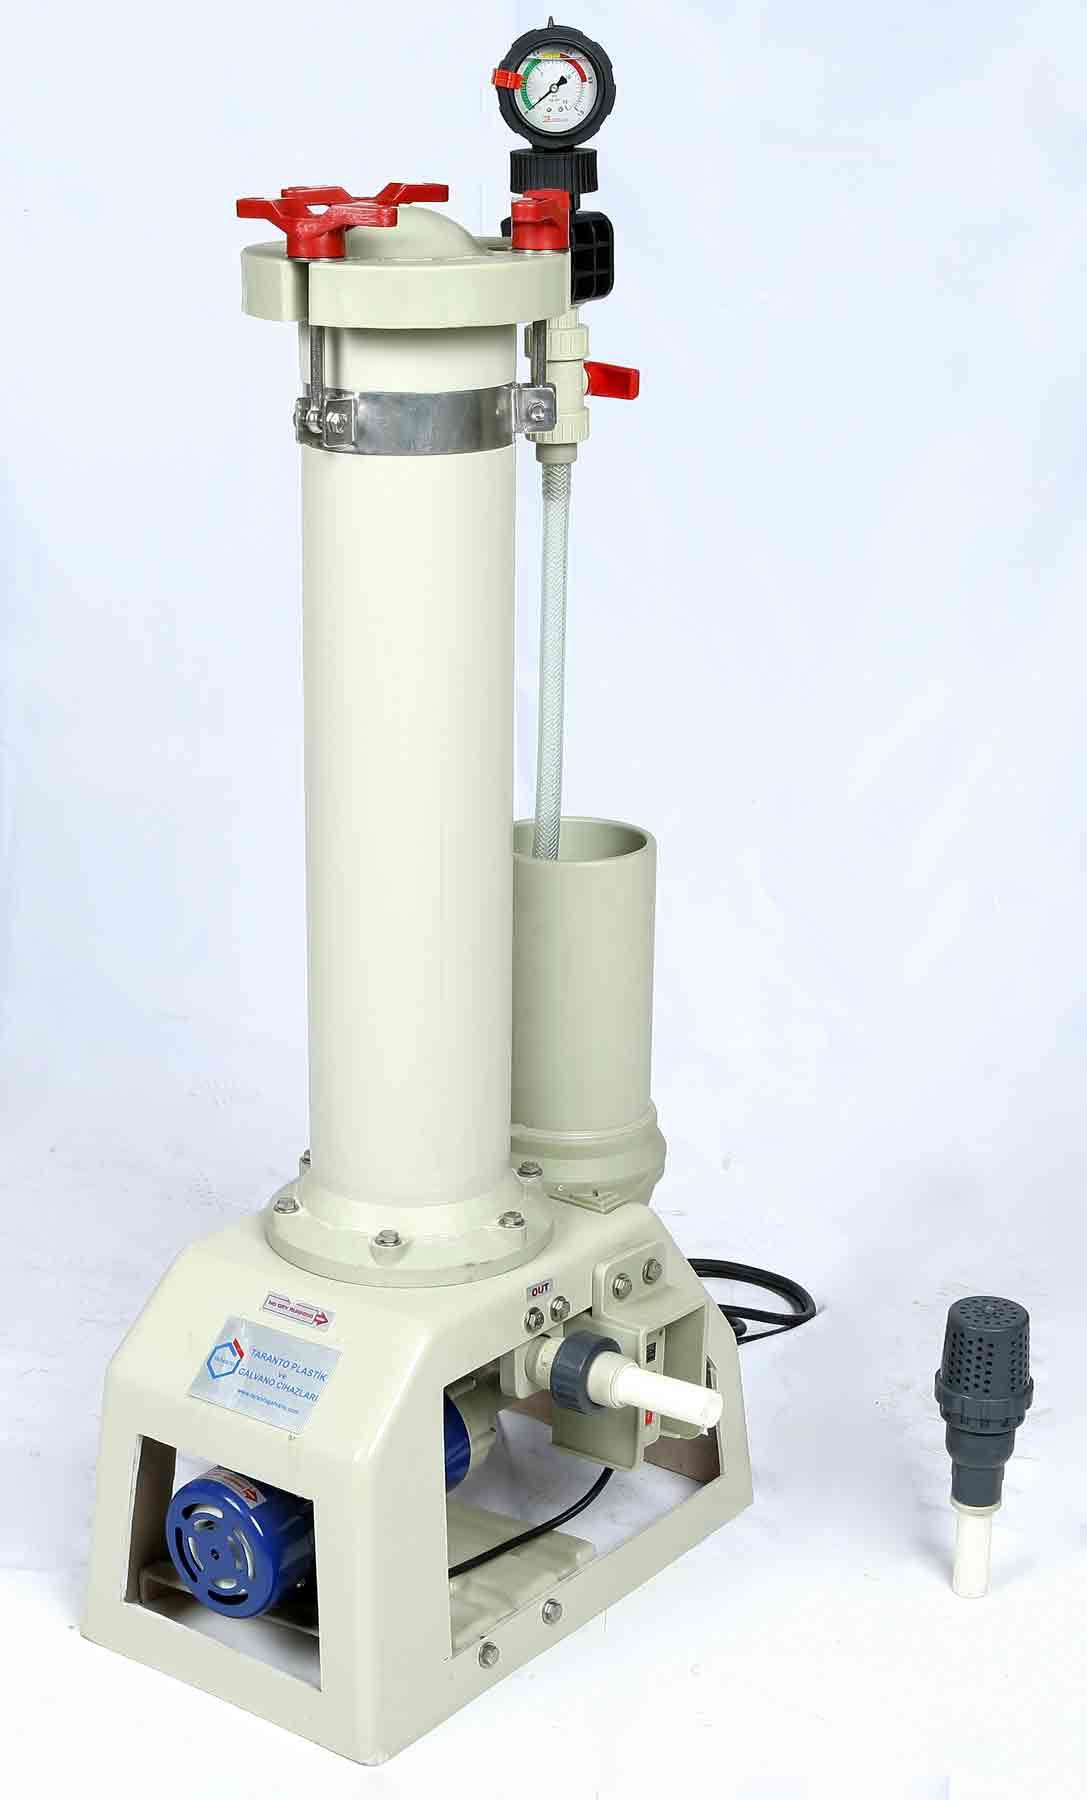 ithal-filtre-cihazlari-9.jpg